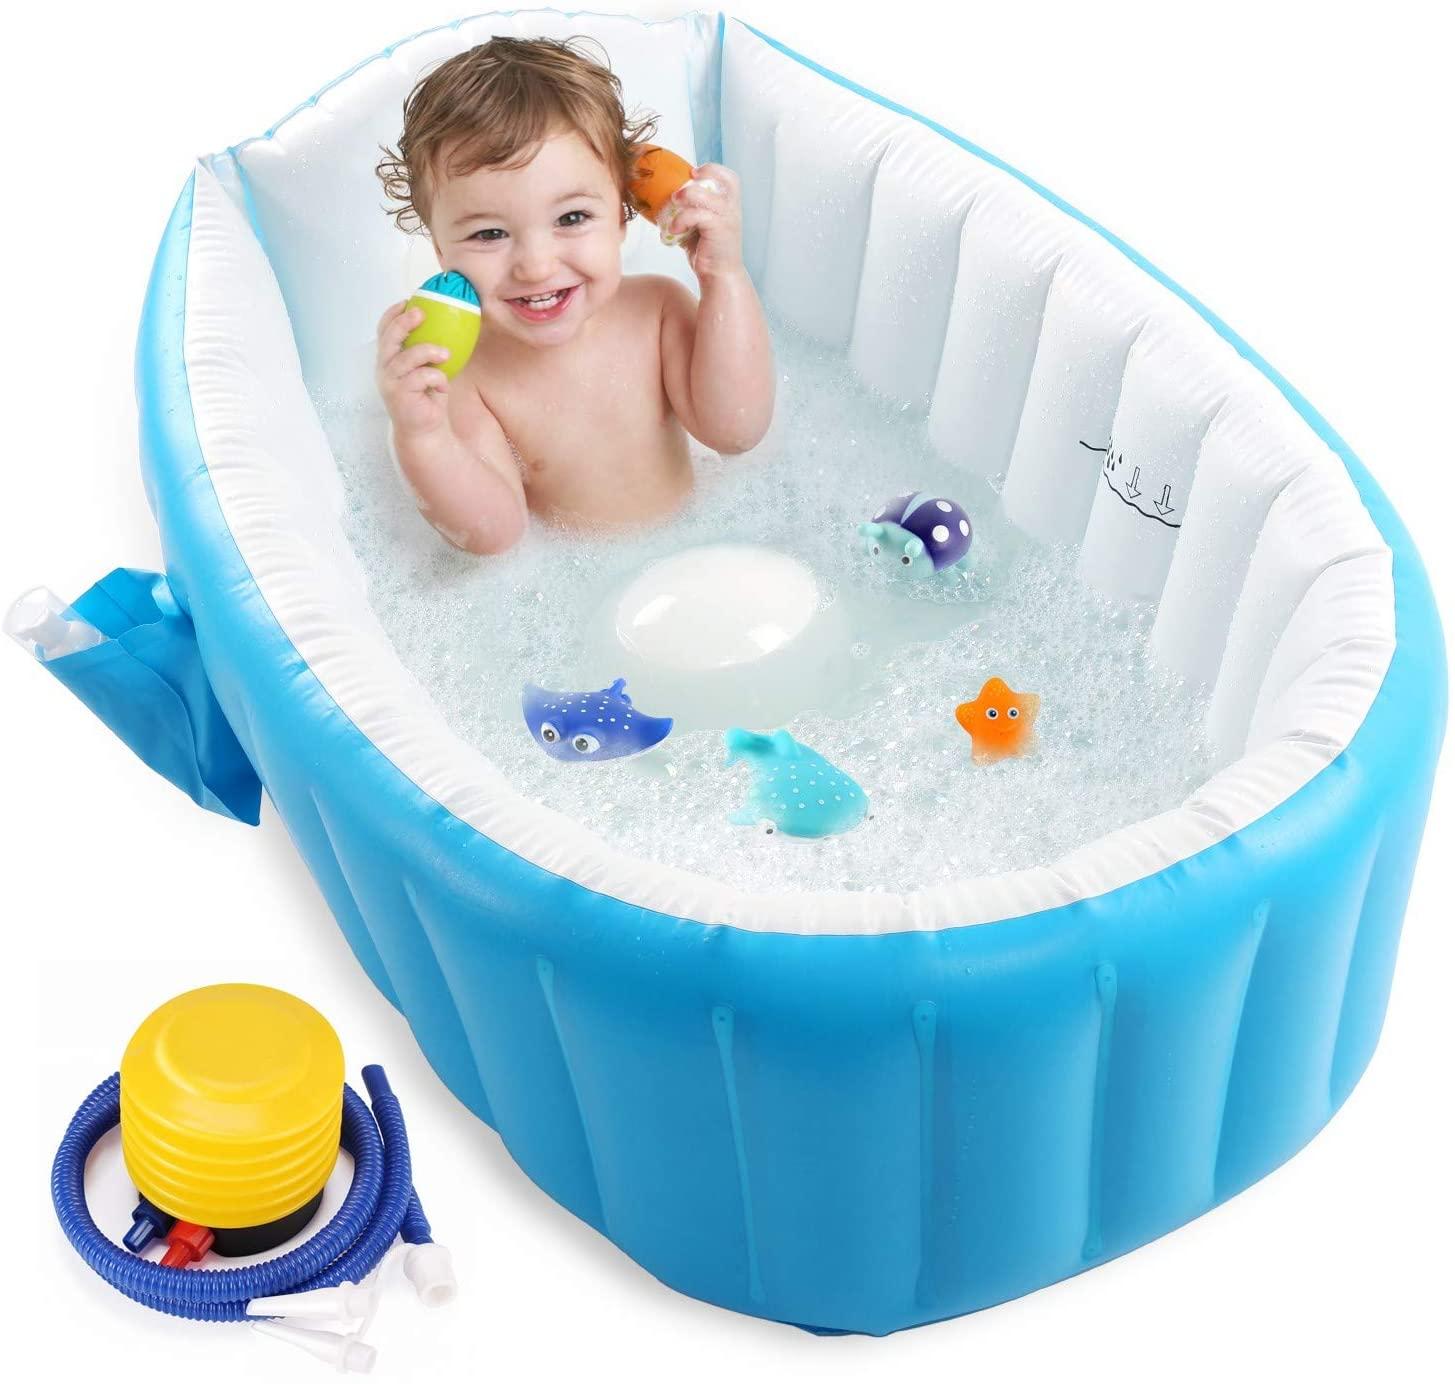 Baby Inflatable Bathtub, Portable Infant Toddler Bathing Tub Non Slip Travel Bathtub Mini Air Swimming Pool Kids Thick Foldable Shower Basin with Air Pump, Blue